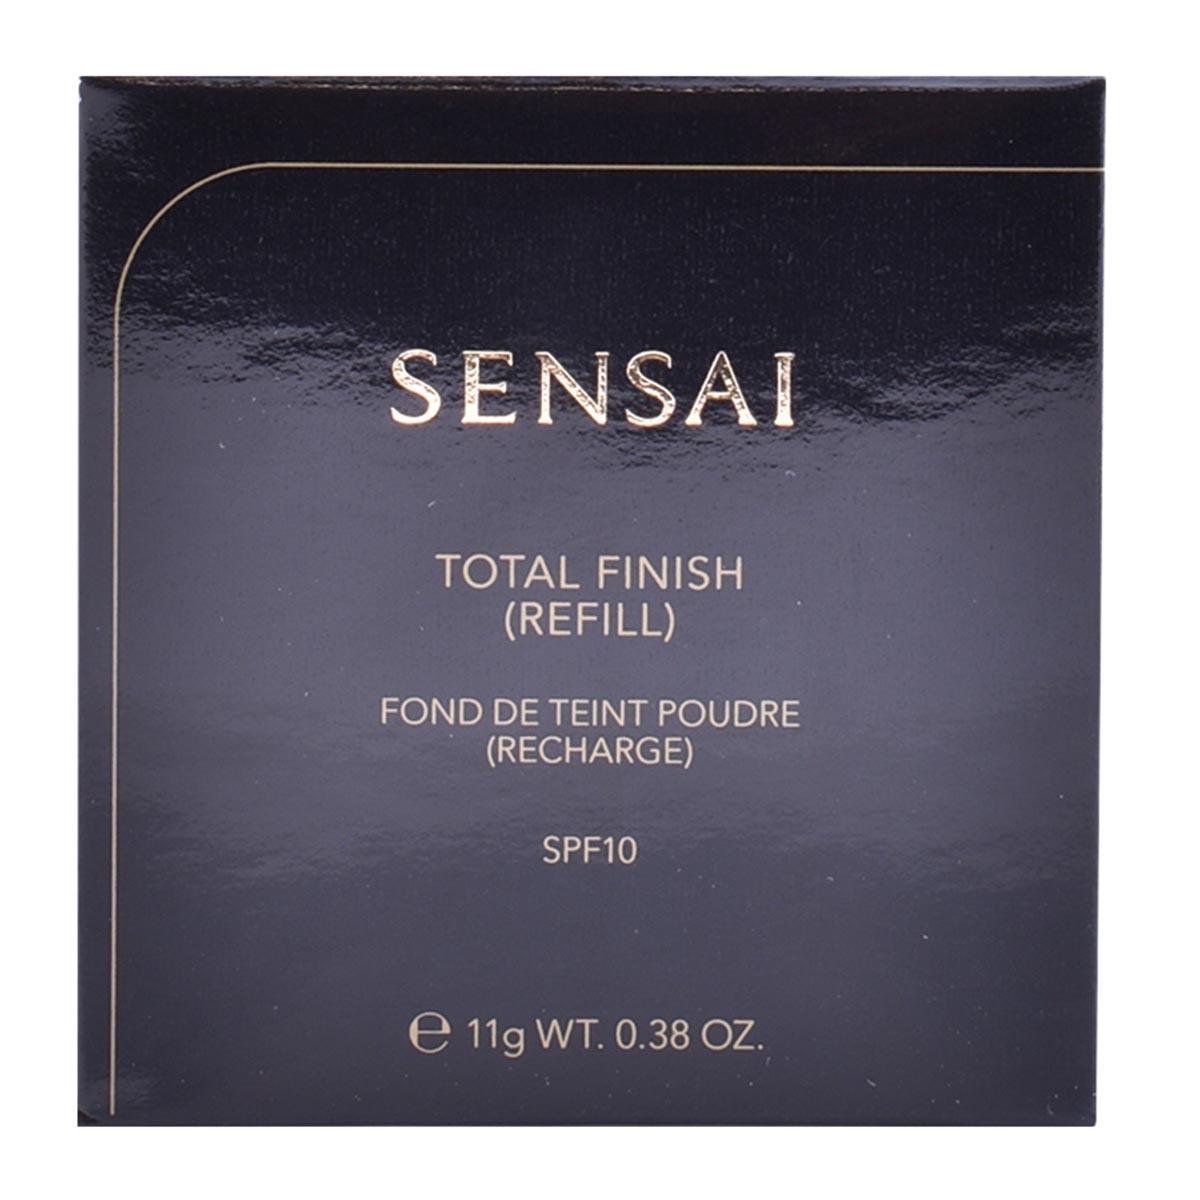 Kanebo sensai cellular foundation total finish tf202 refill